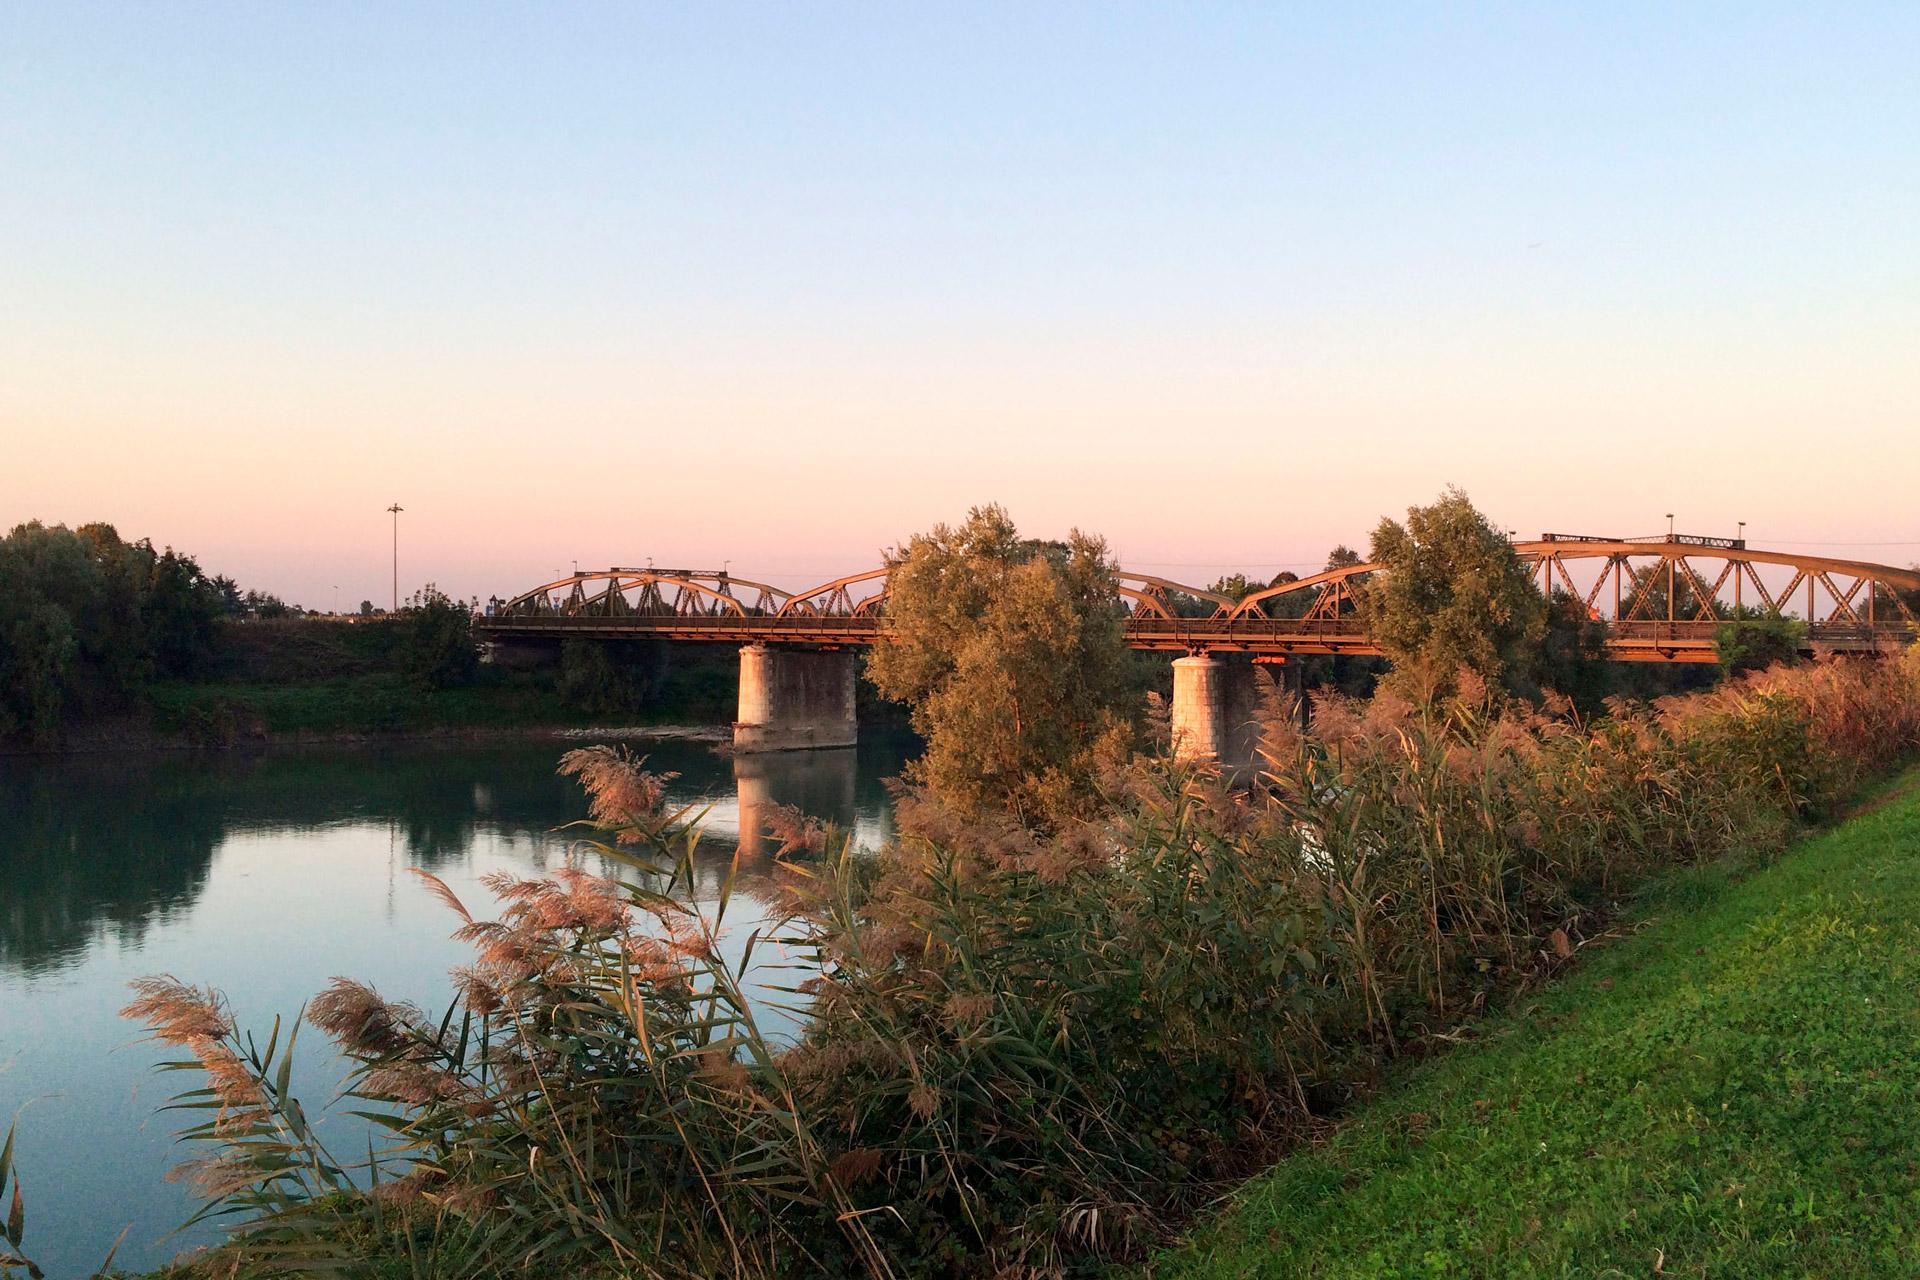 Anguillara Veneta_Il ponte